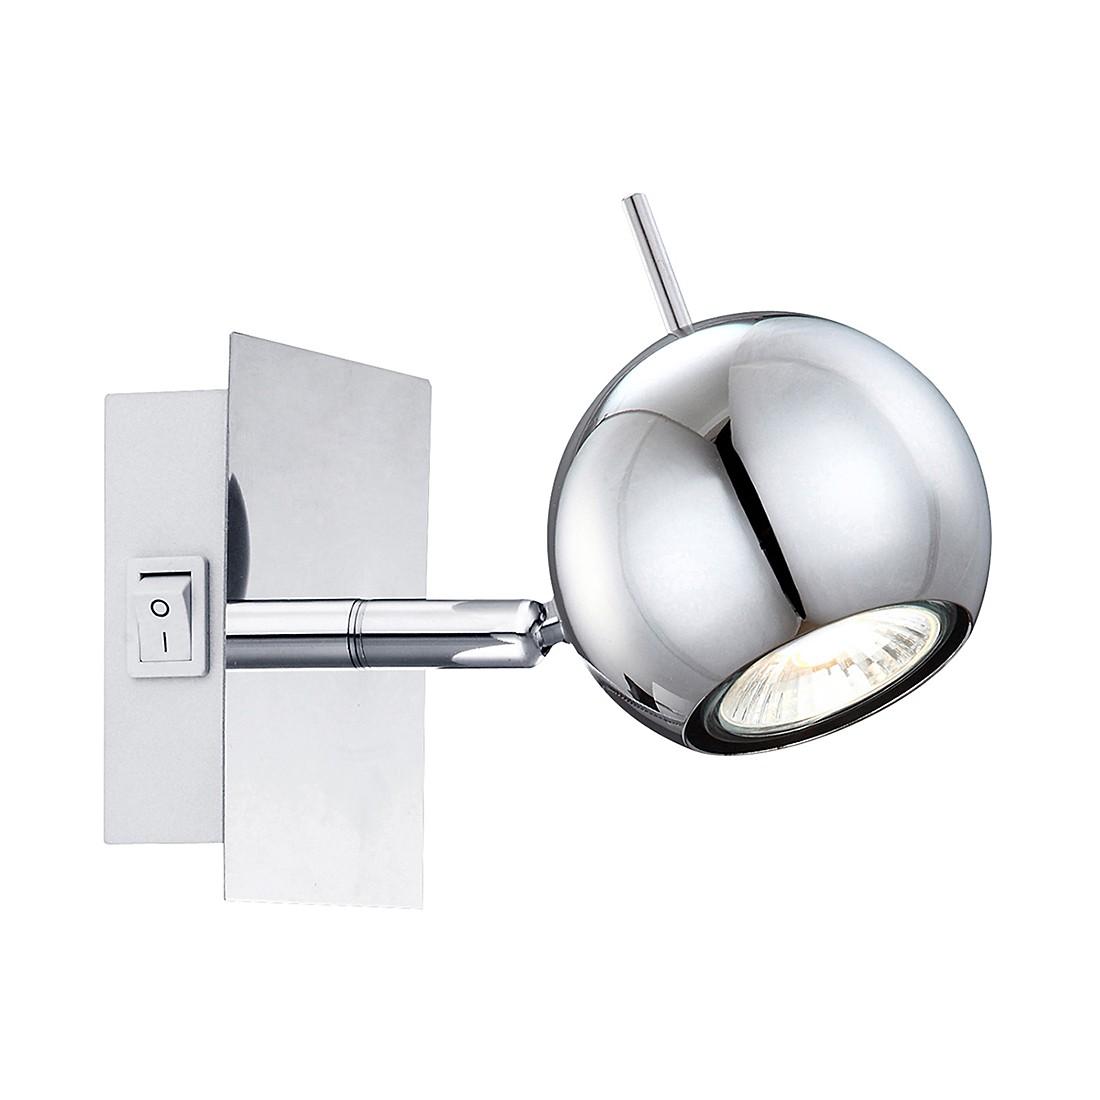 Image of energia A++, Lampada da parete OBERON - Metallo Color argento 1 luce, Globo Lighting